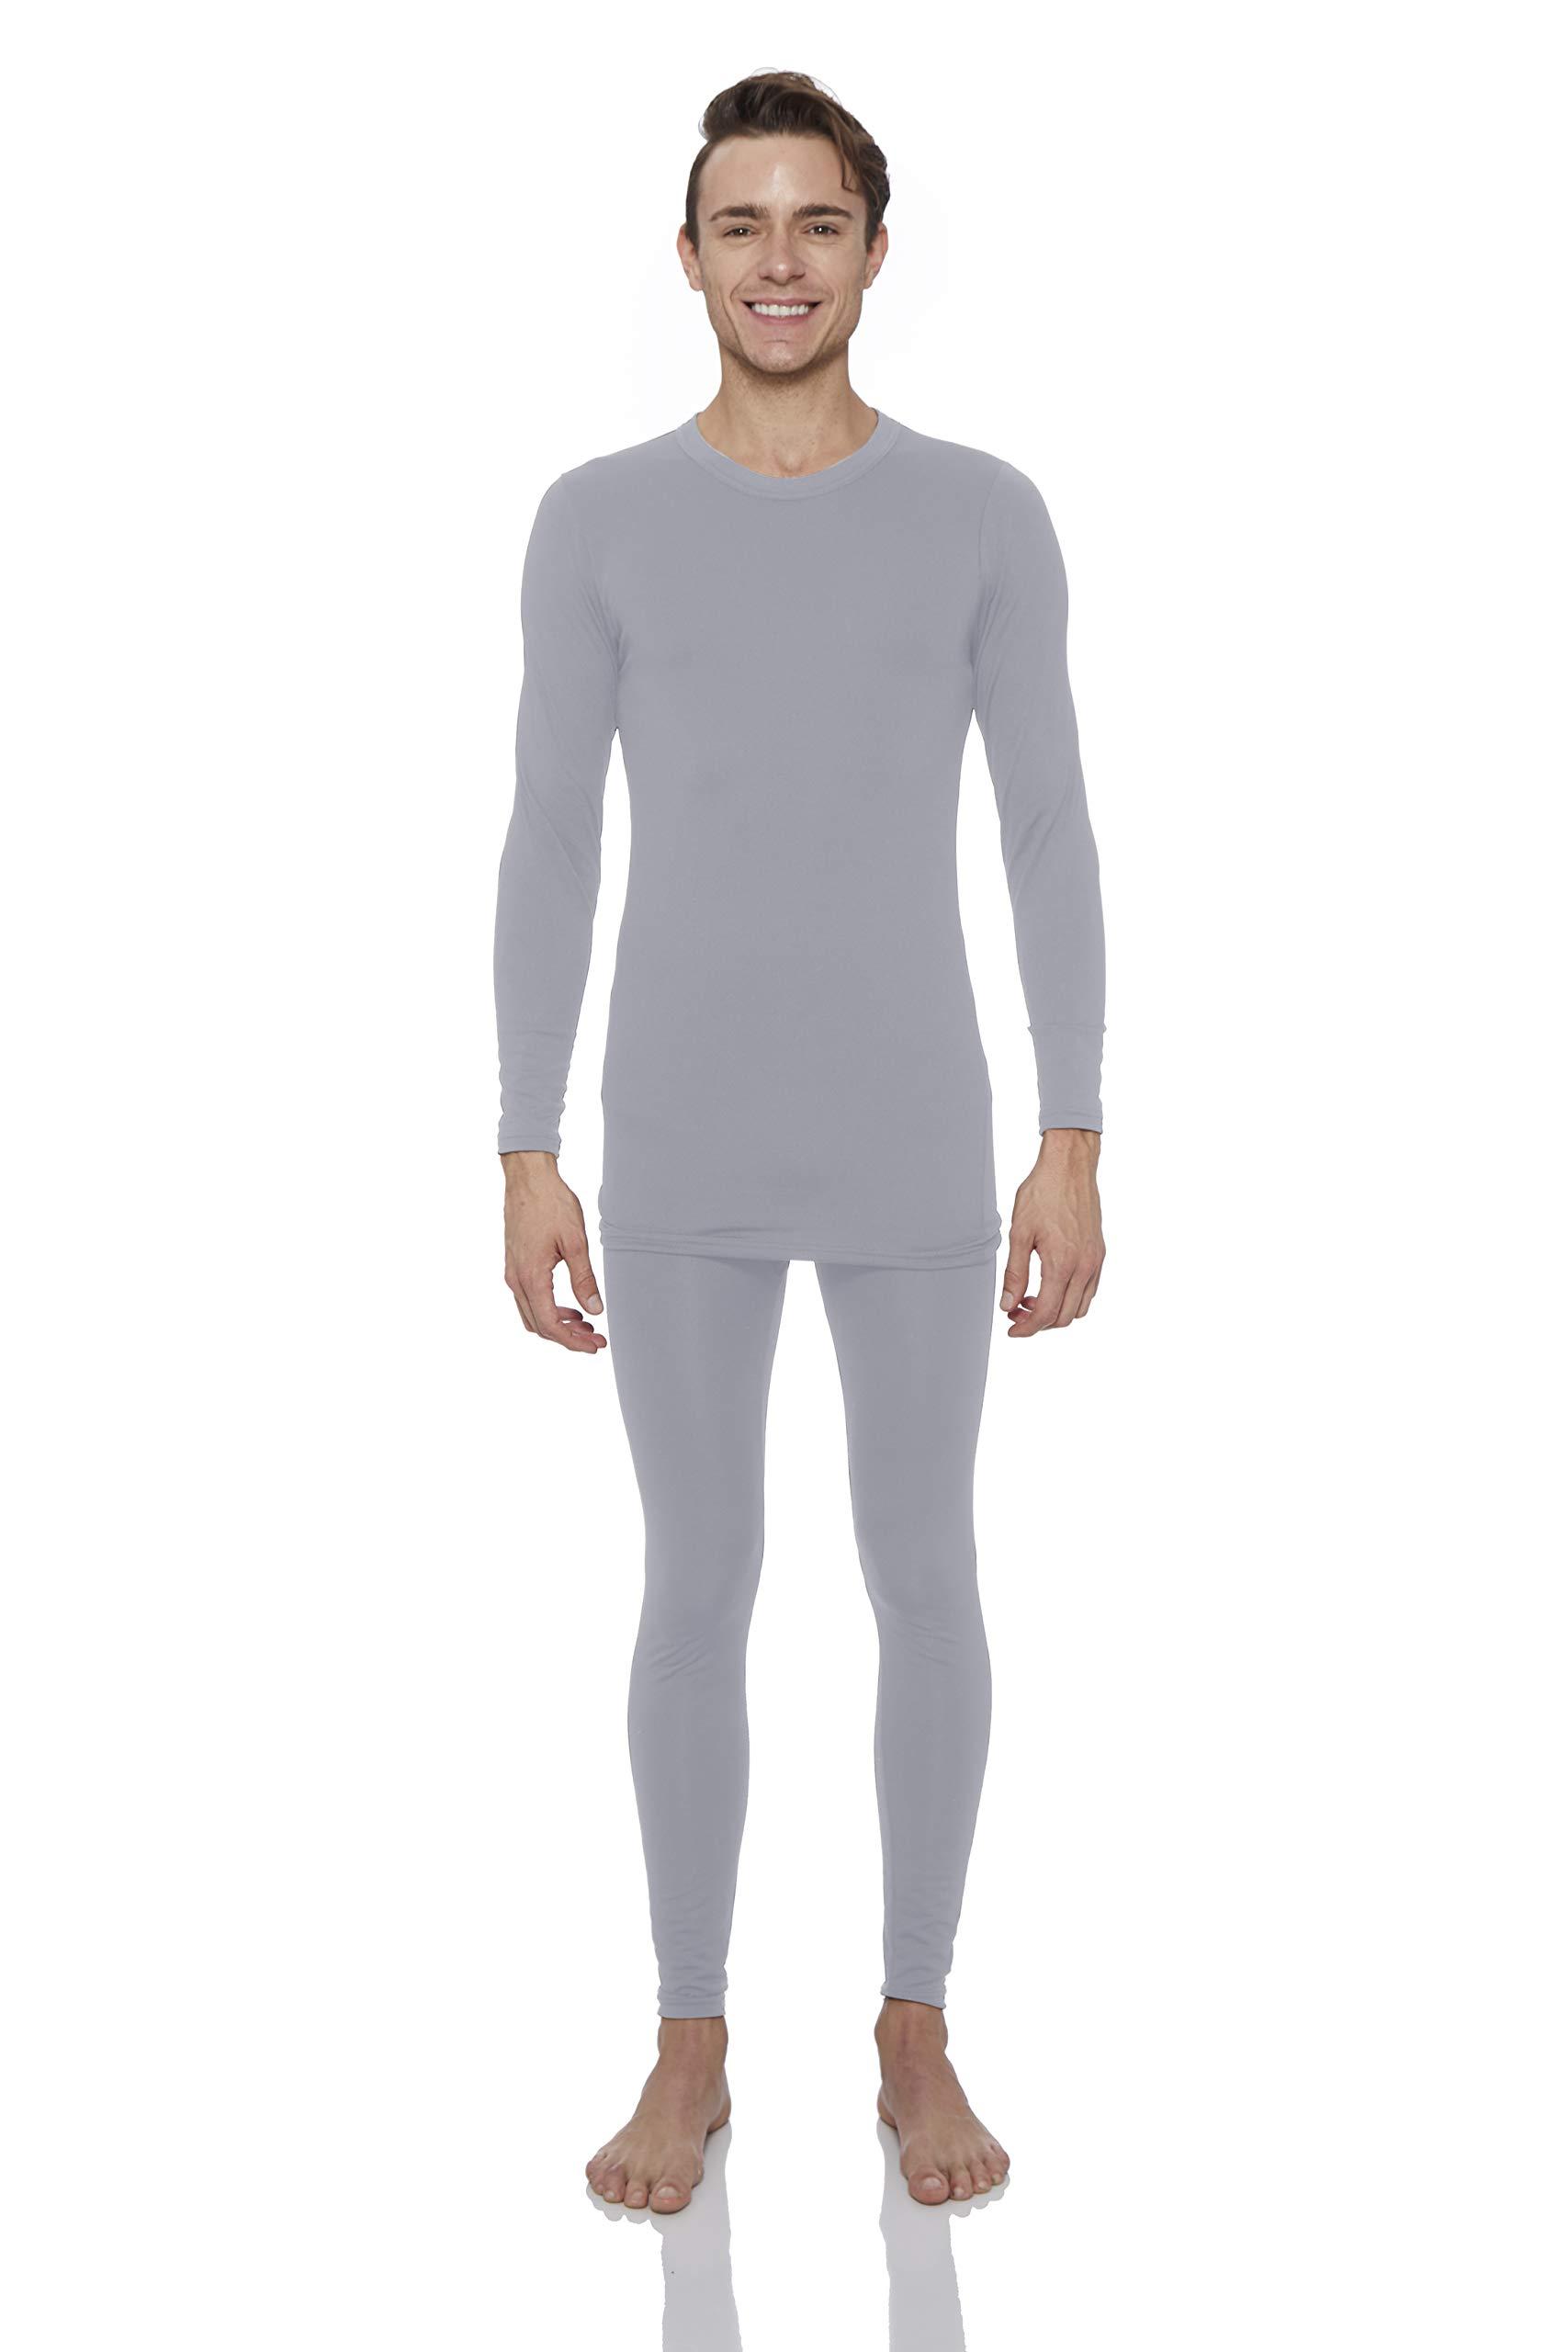 Rocky Thermal Underwear for Men Fleece Lined Thermals Men's Base Layer Long John Set Grey by Rocky